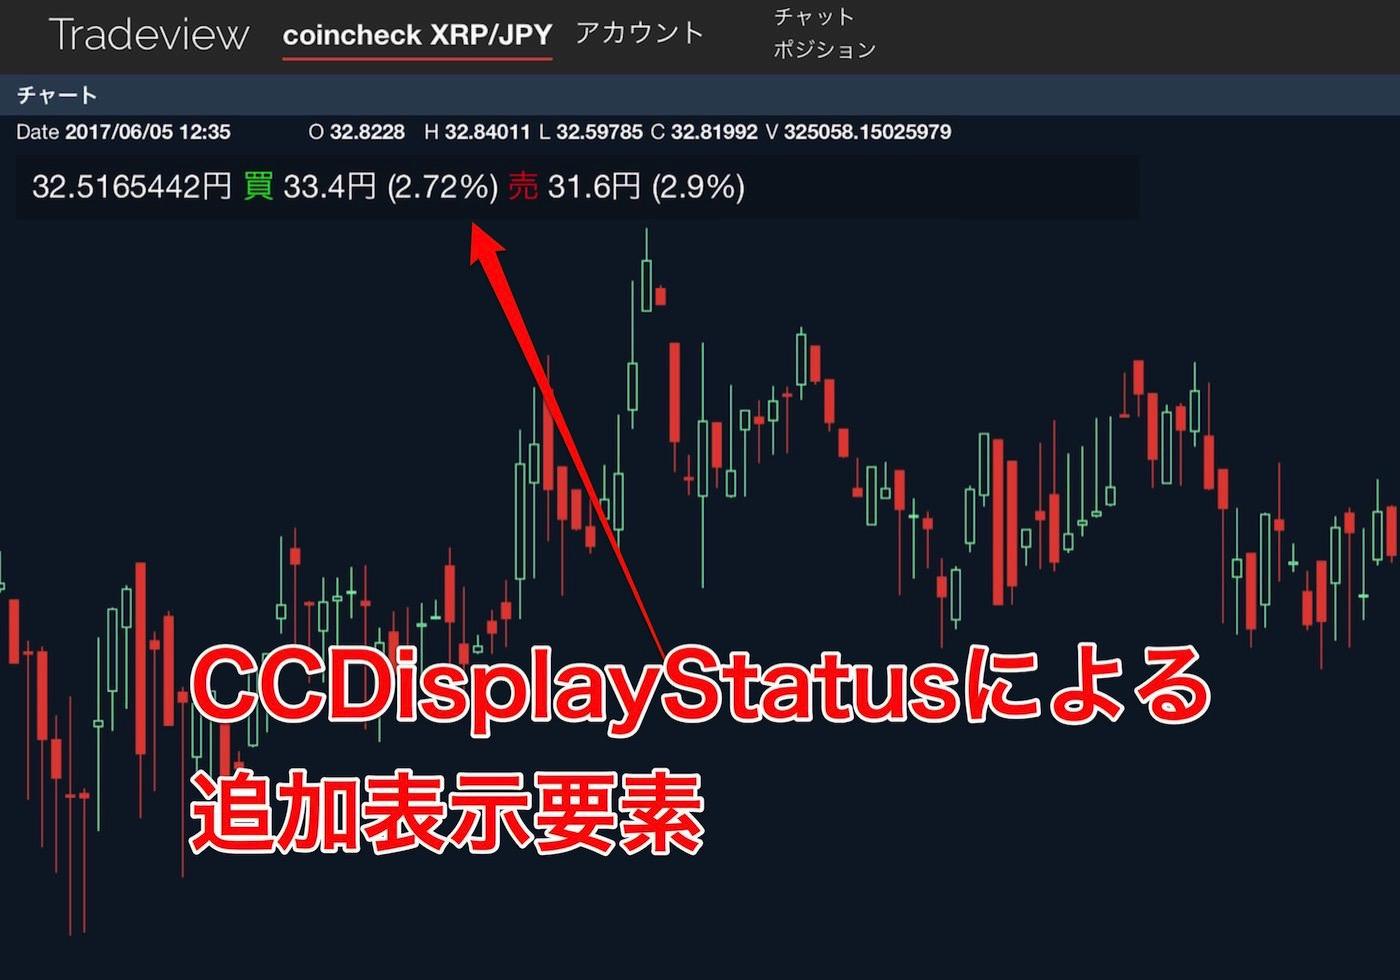 Ccdisplaystatus 00001